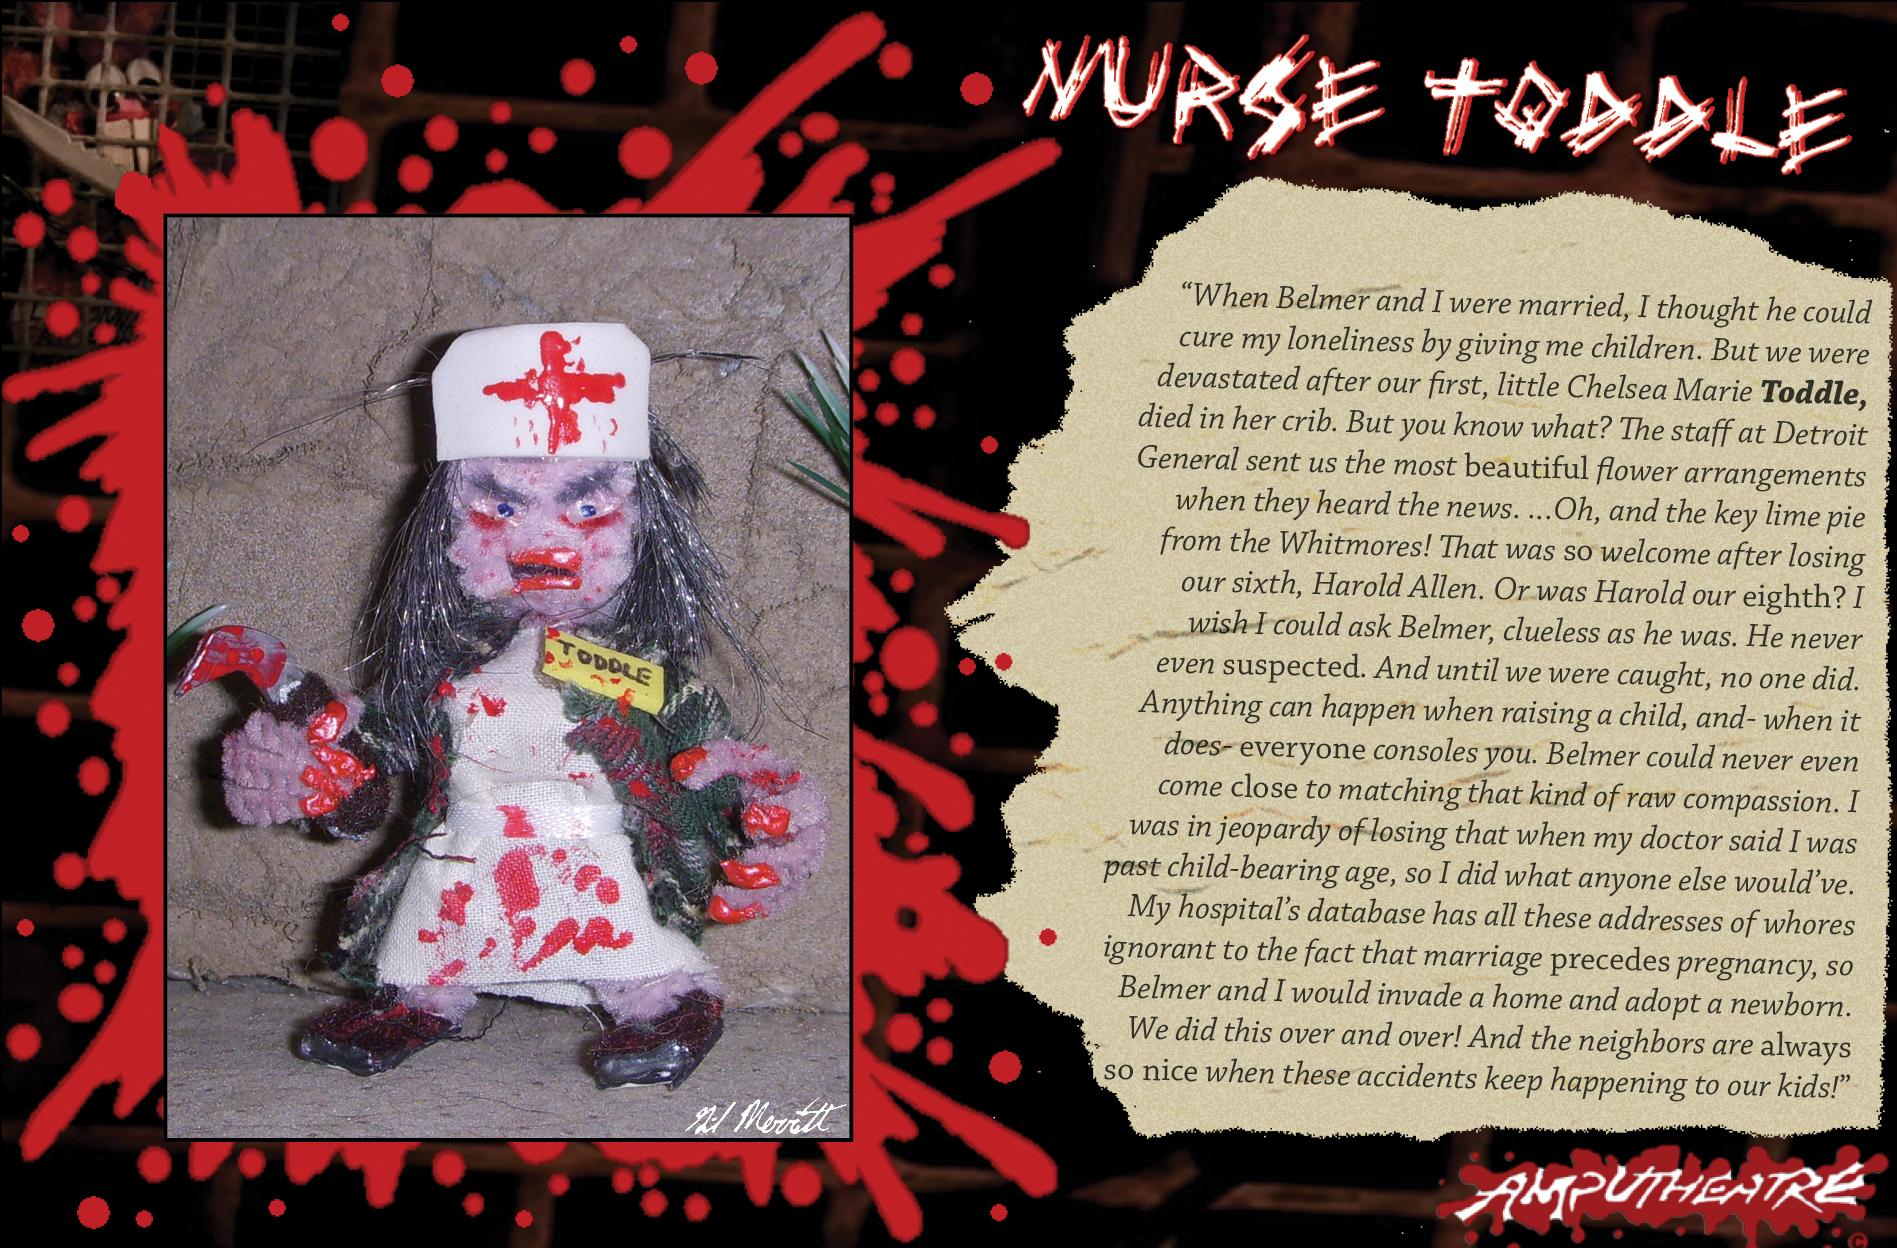 Profile Nurse Toddle.jpg